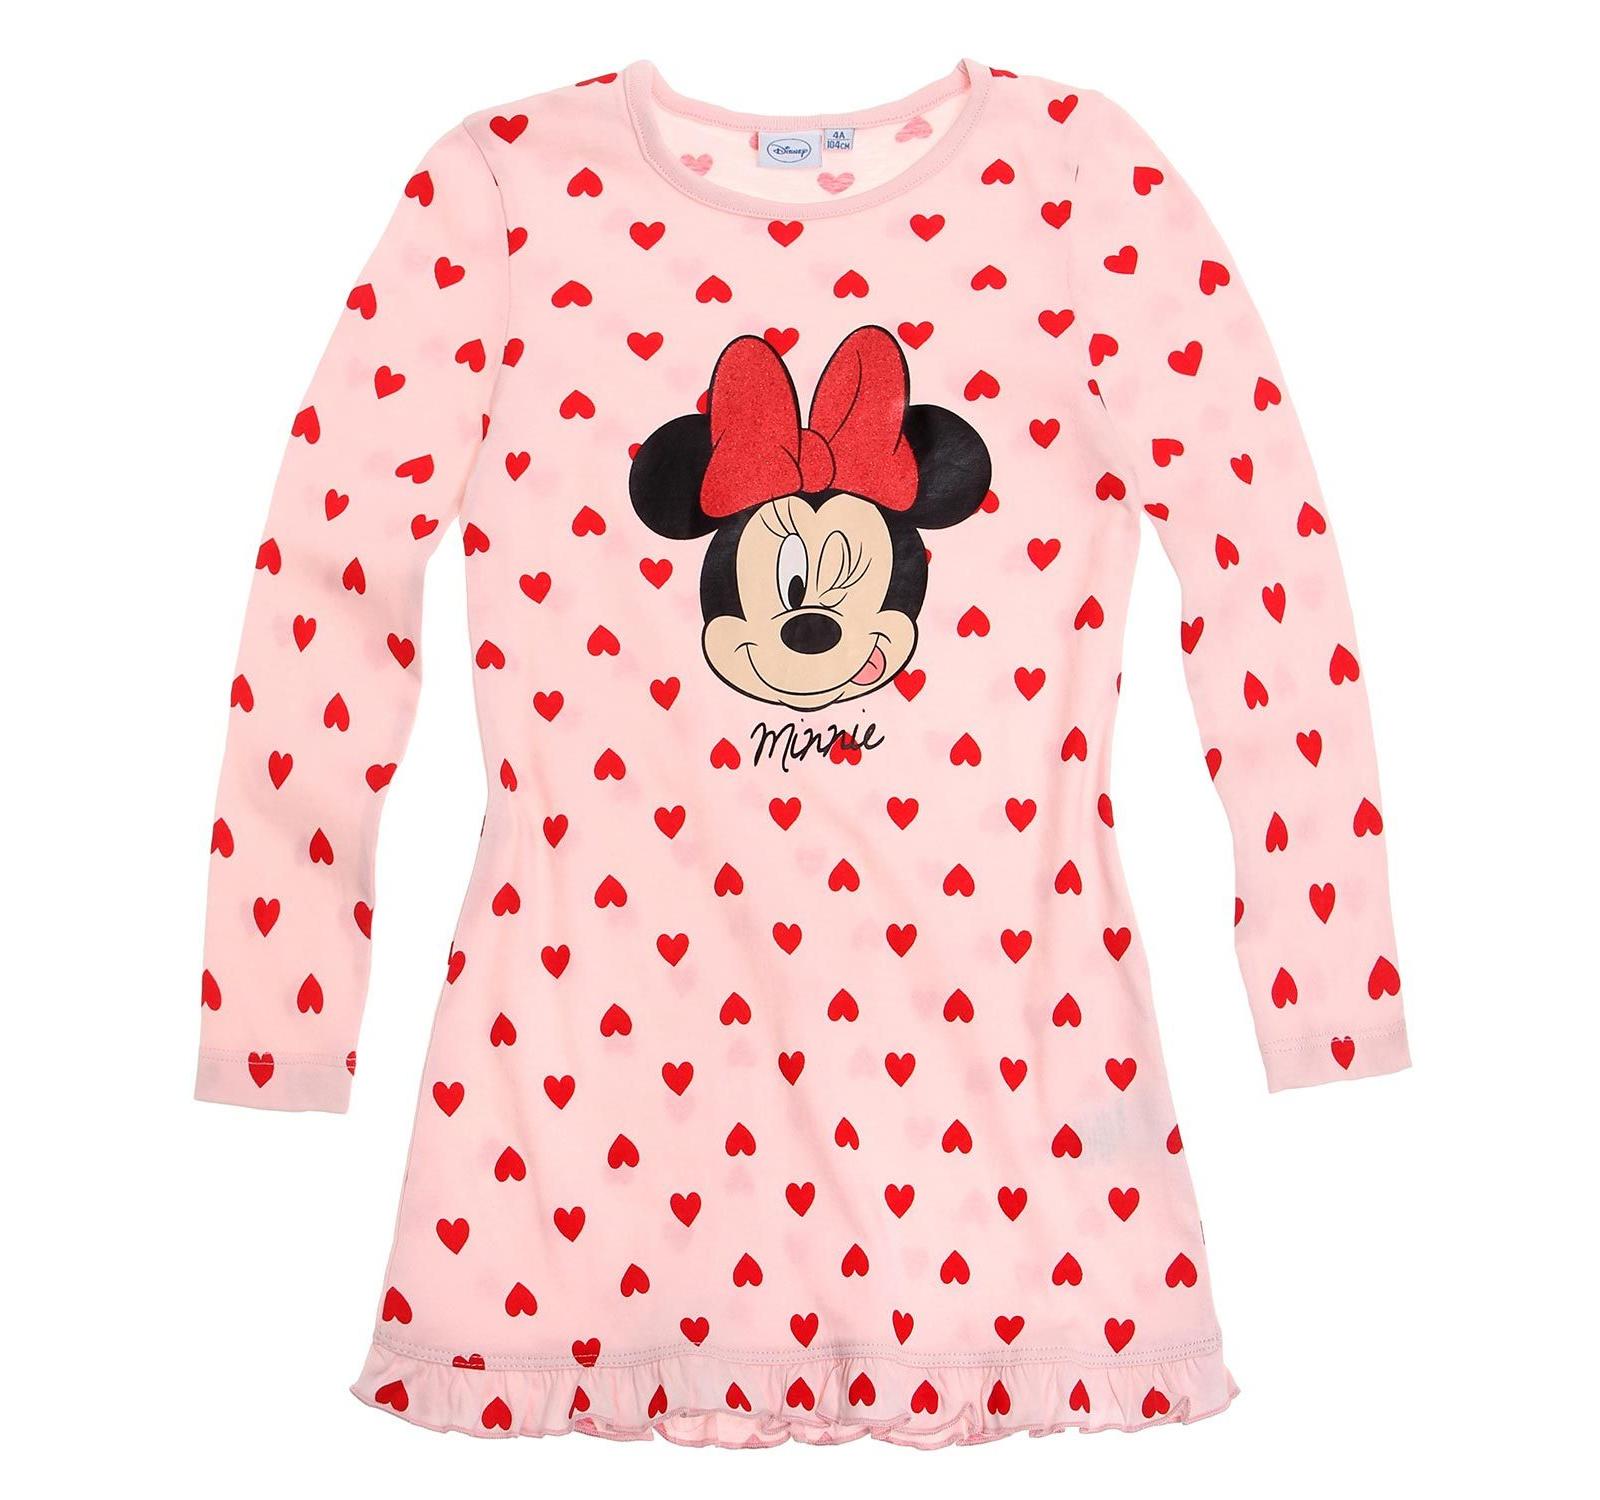 Minnie® Camasa noapte (92-128) Roz pal